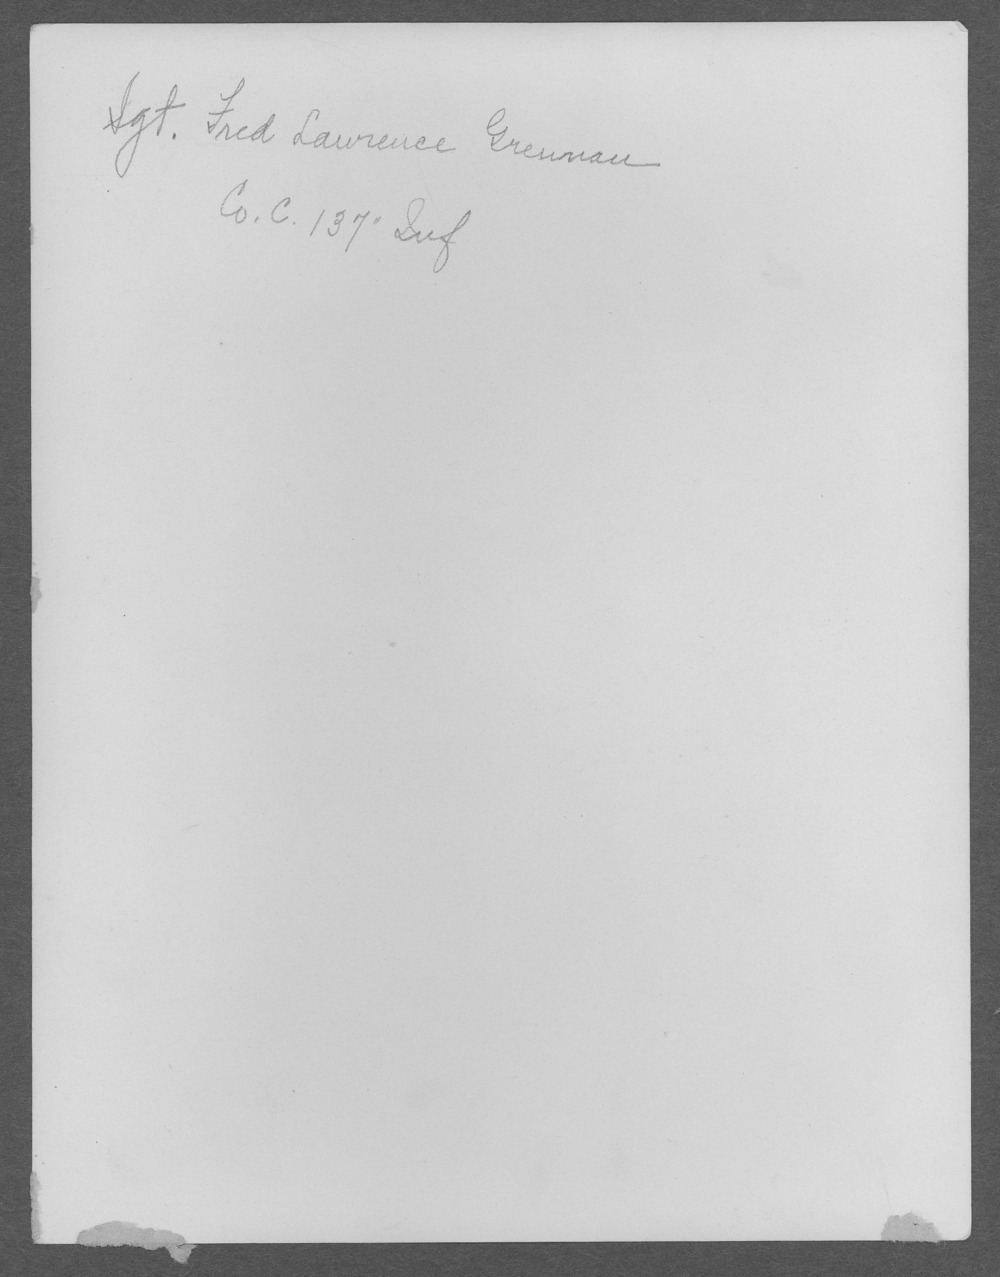 Fred Lawrence Grennan, World War I soldier - 2